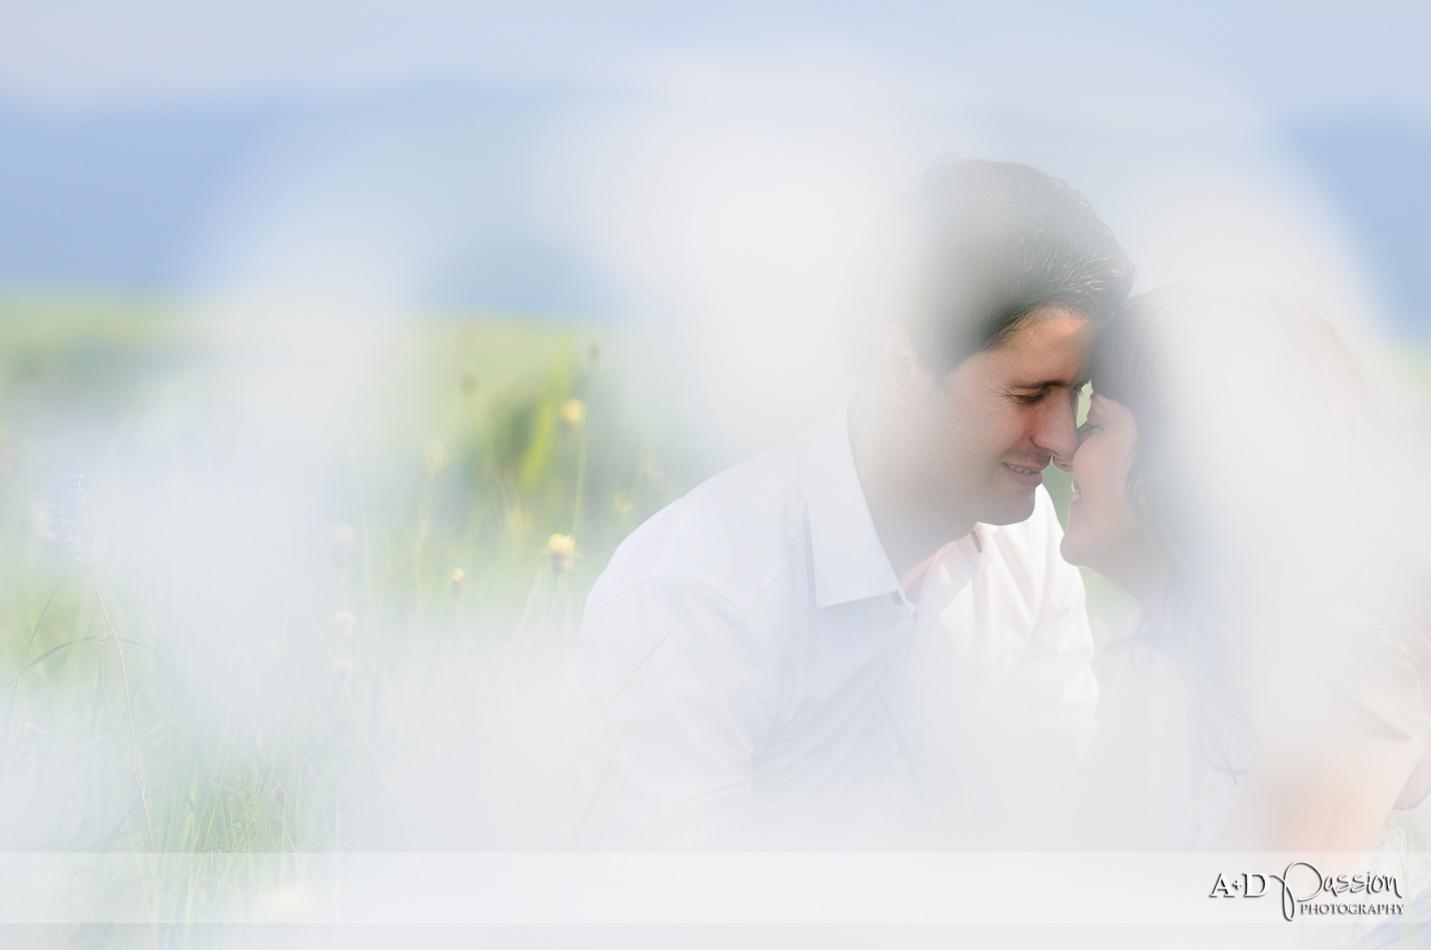 AD Passion Photography | 07042012_fotograf-profesionist-nunta_after-wedding_carmen-si-costi_0052 | Adelin, Dida, fotograf profesionist, fotograf de nunta, fotografie de nunta, fotograf Timisoara, fotograf Craiova, fotograf Bucuresti, fotograf Arad, nunta Timisoara, nunta Arad, nunta Bucuresti, nunta Craiova